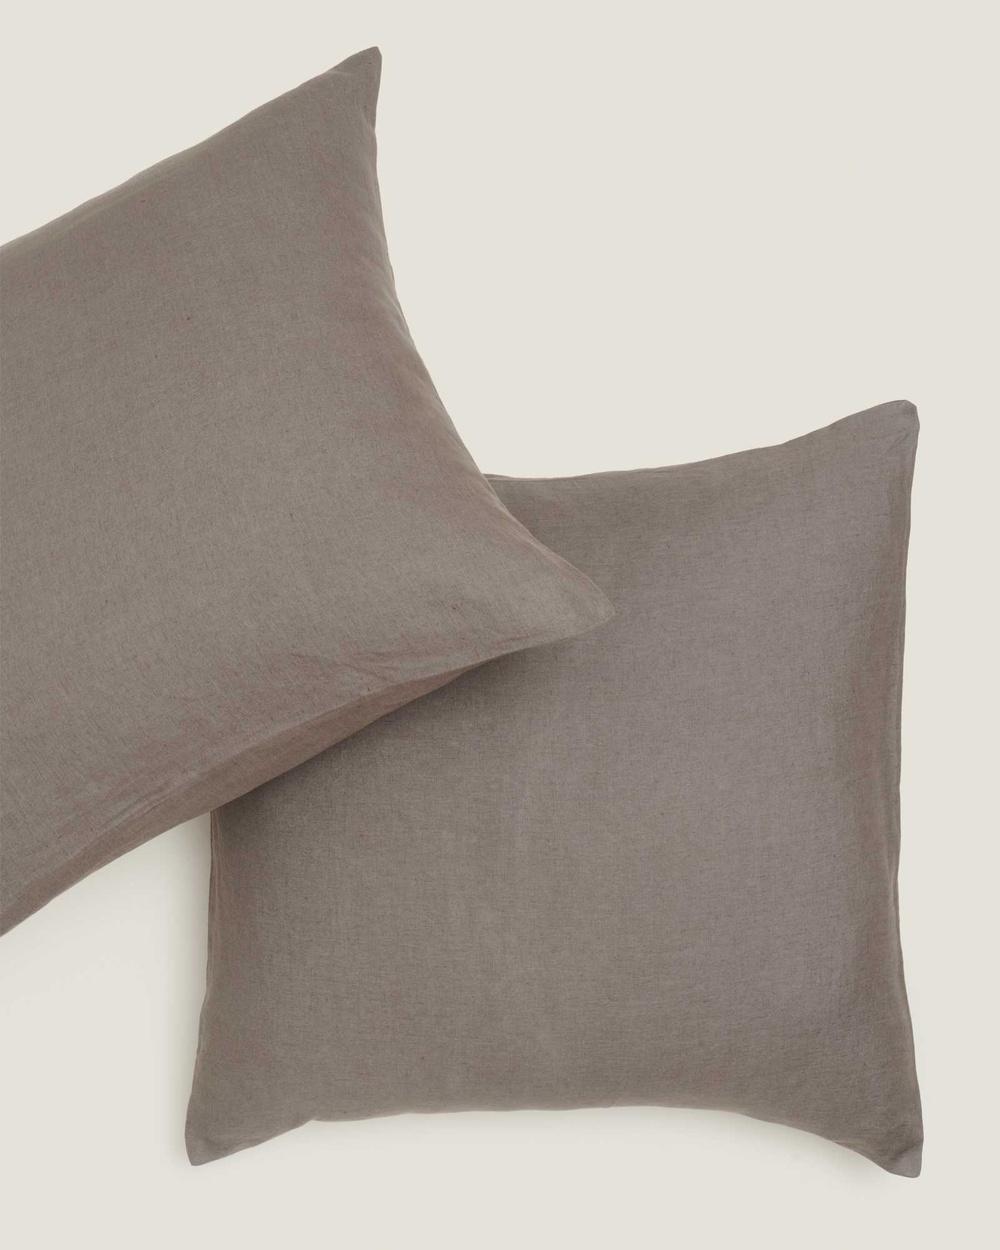 Carlotta + Gee 100% Linen European Pillowslip Set Home Grey Australia